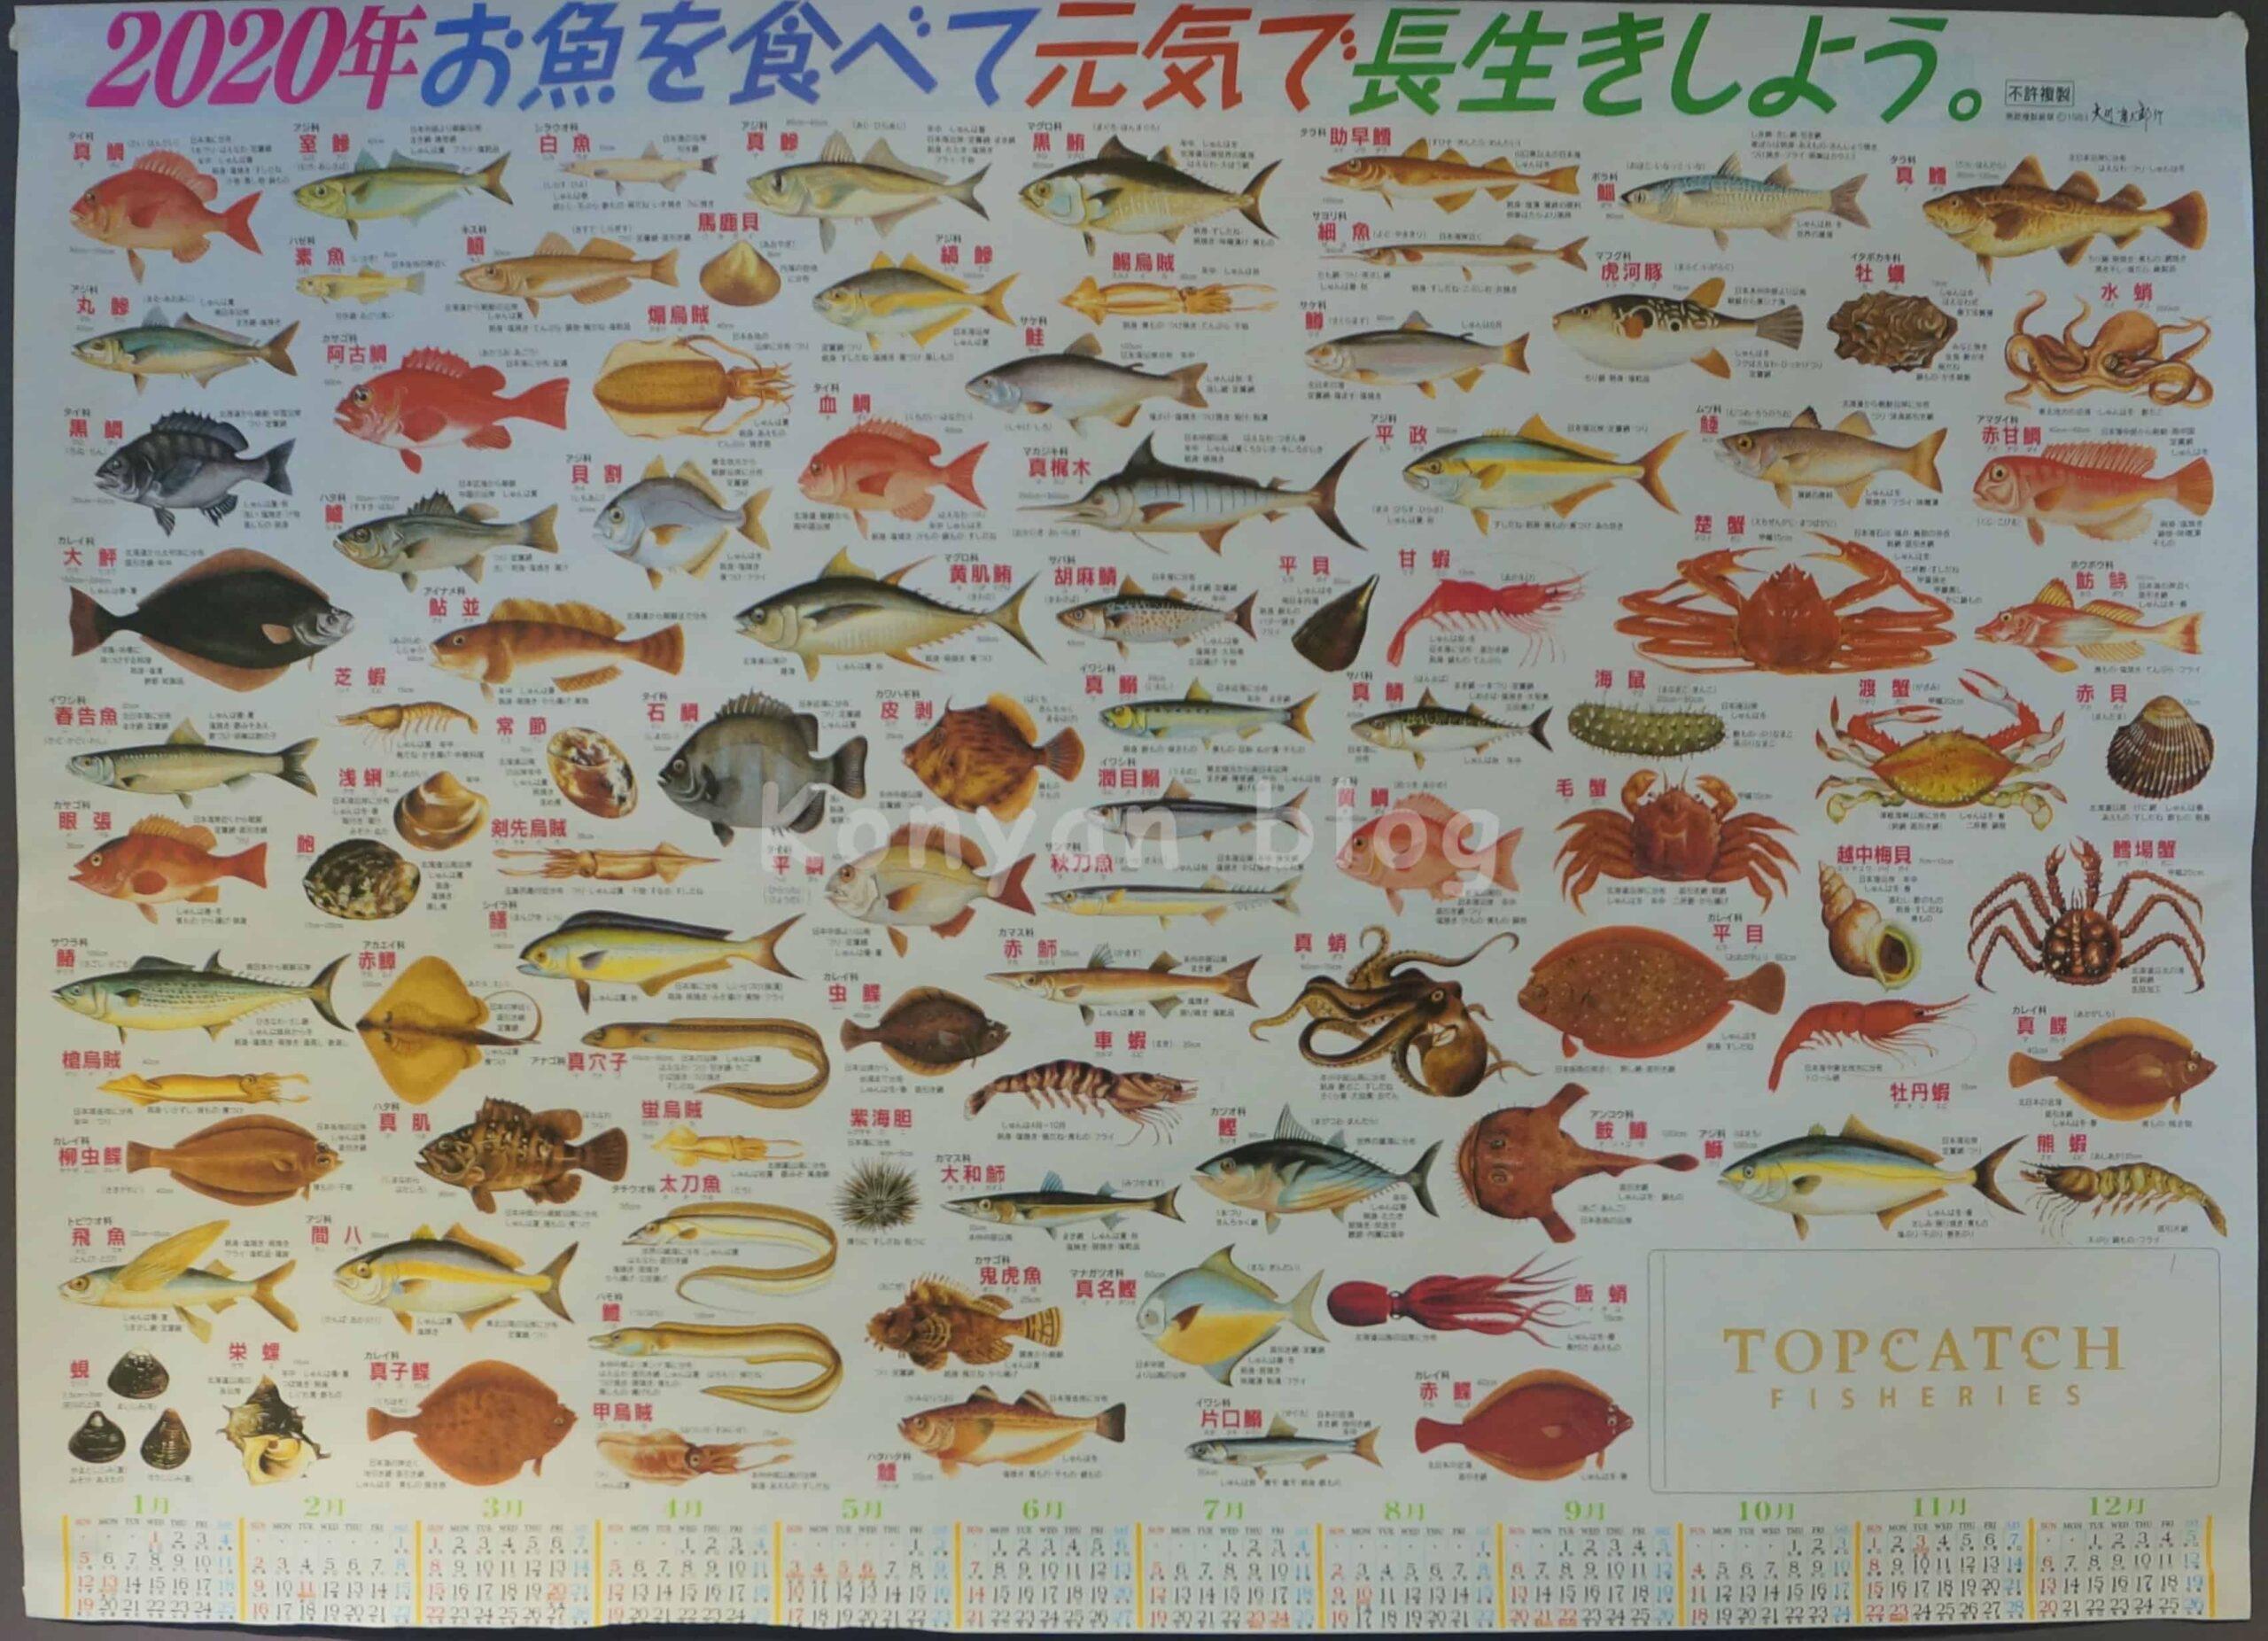 Top Catch Fisheries 一頂魚屋 刺身 ポスター